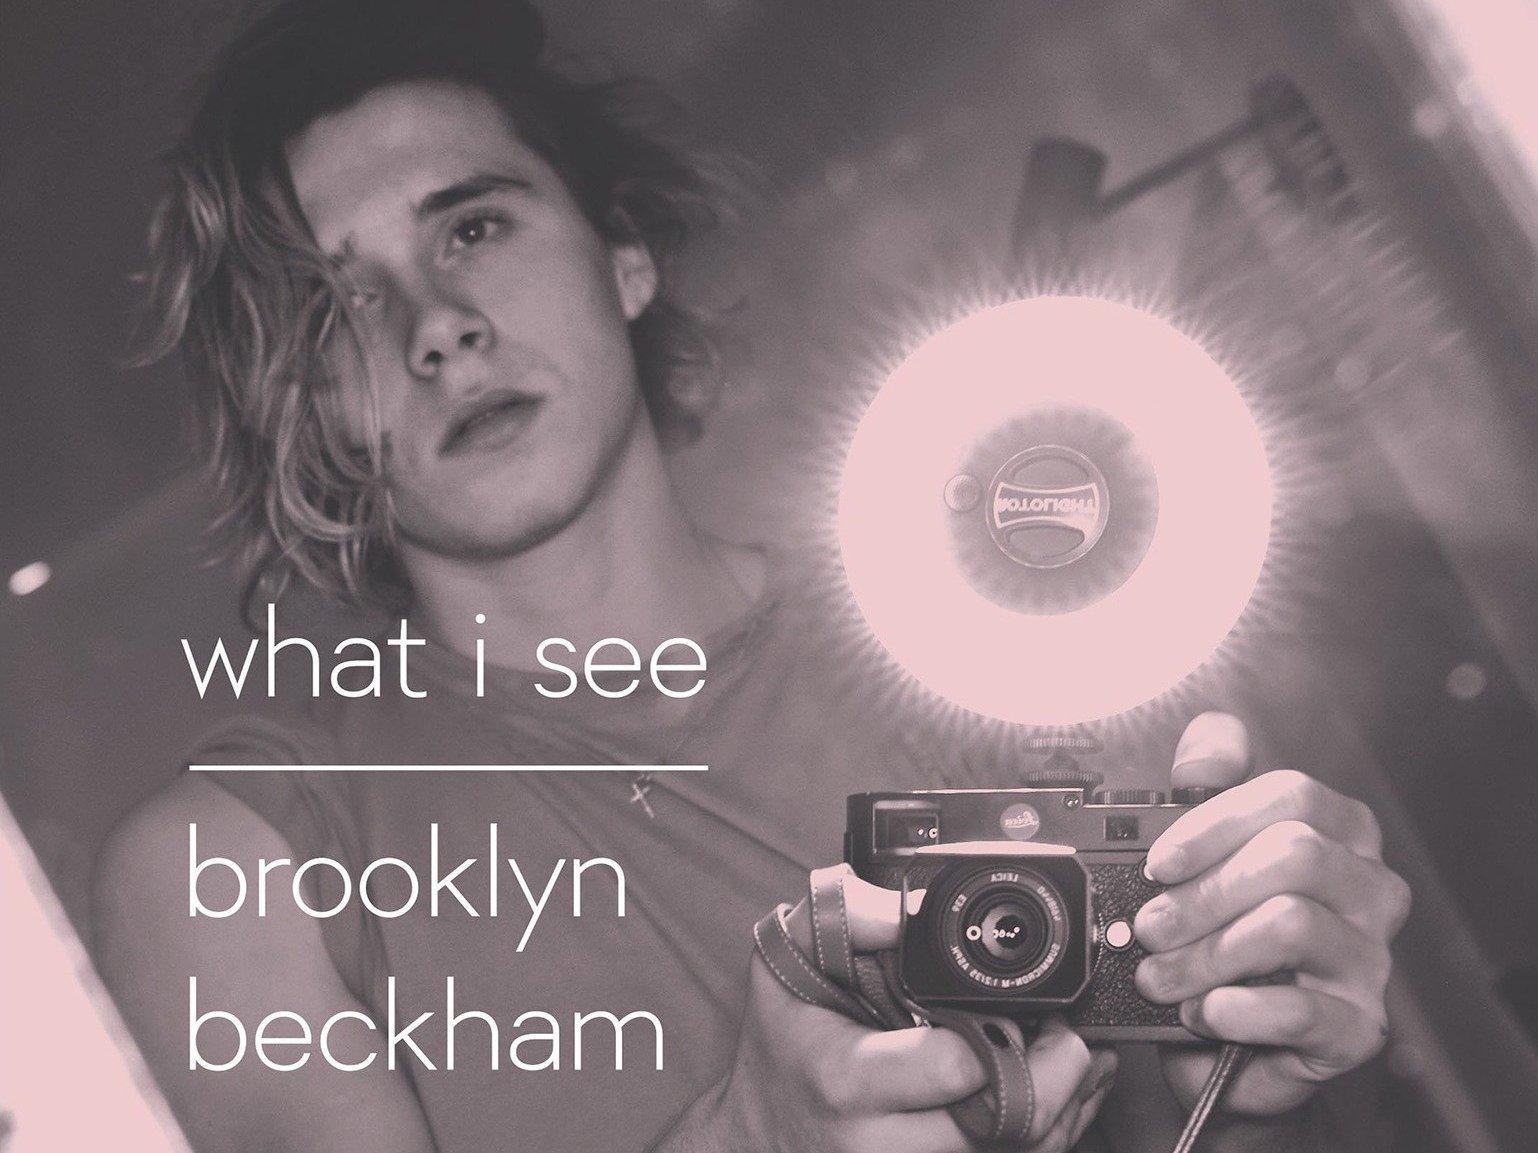 Brooklyn Beckham Struggles at Rankin Internship Due to 'Lack of Basic Skills'